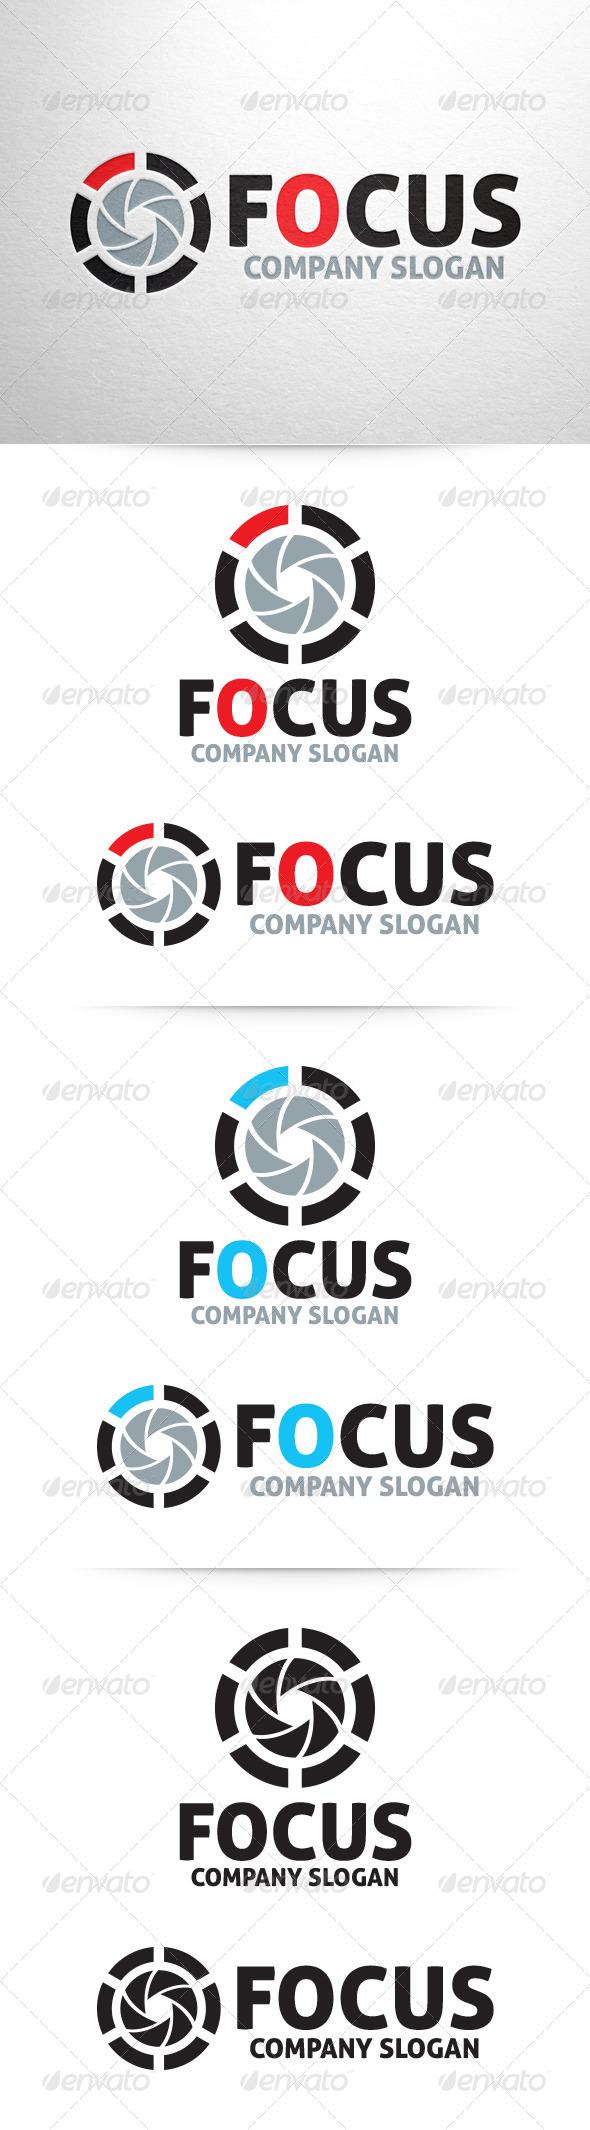 Focus - Photography Logo Template